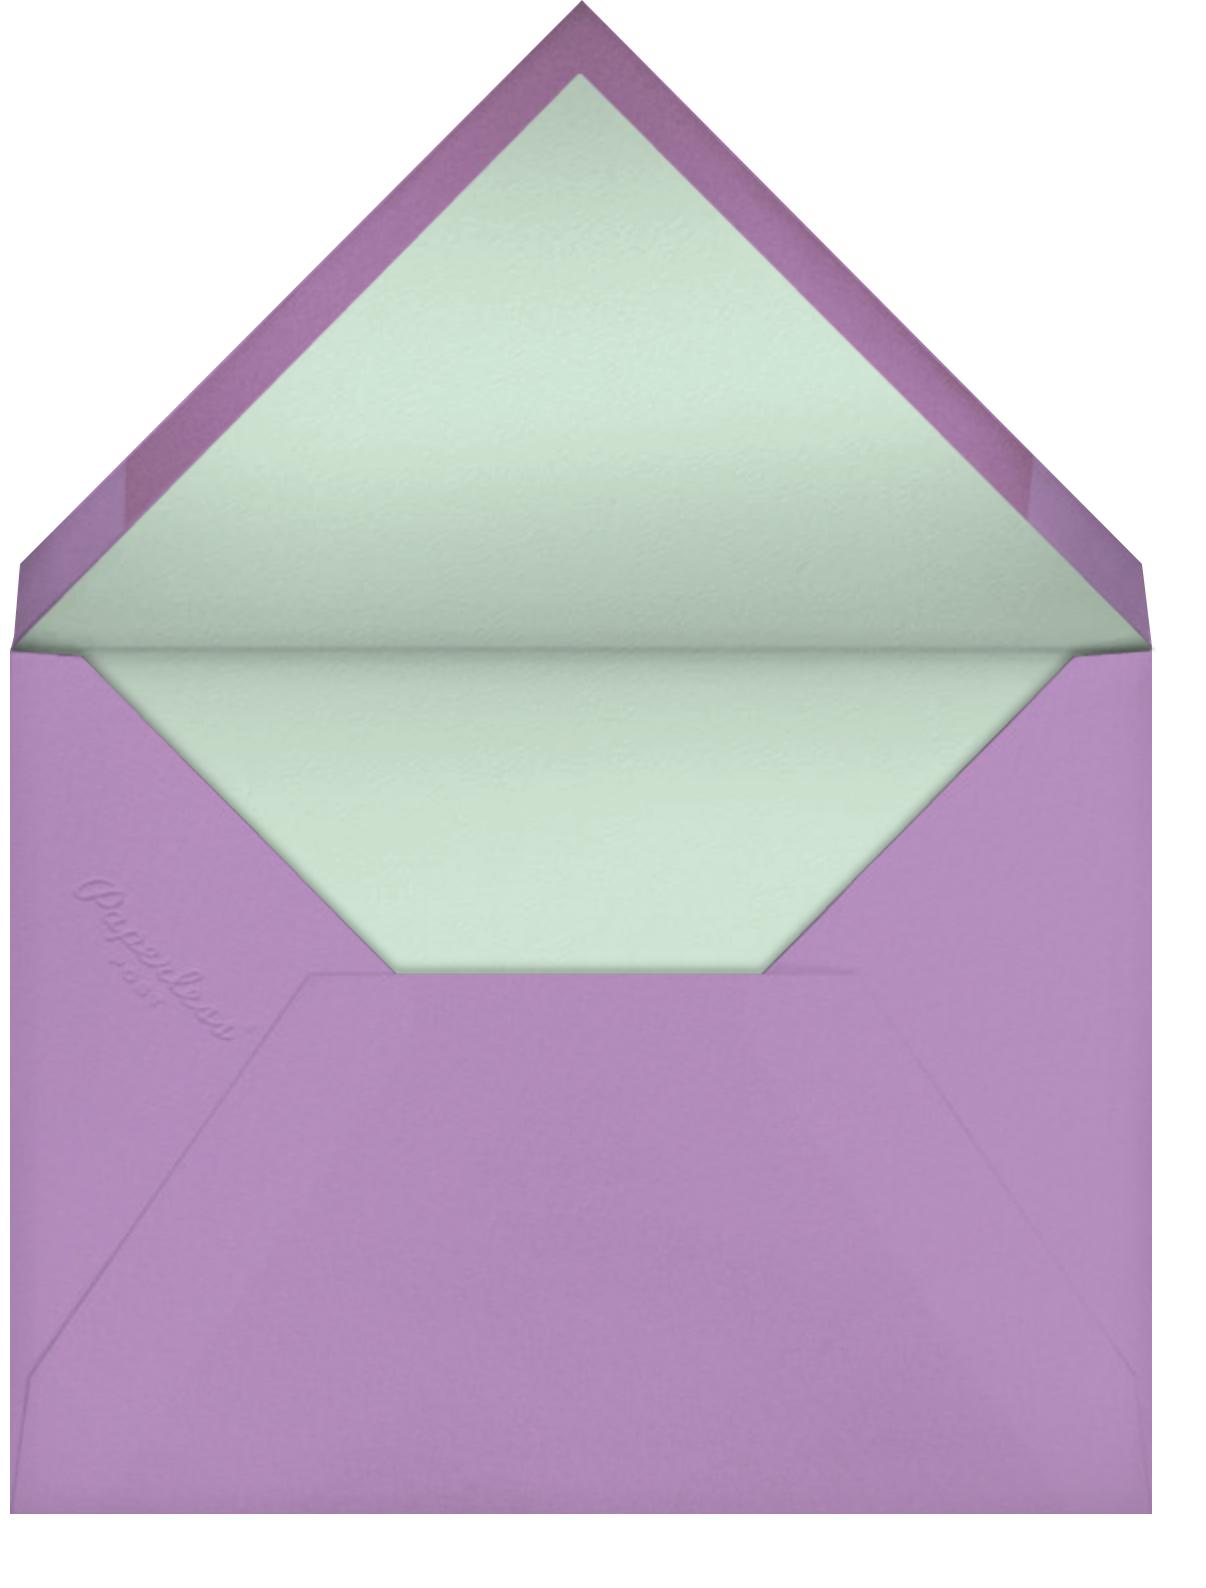 Painted Posies - Wisteria - kate spade new york - Bridal shower - envelope back